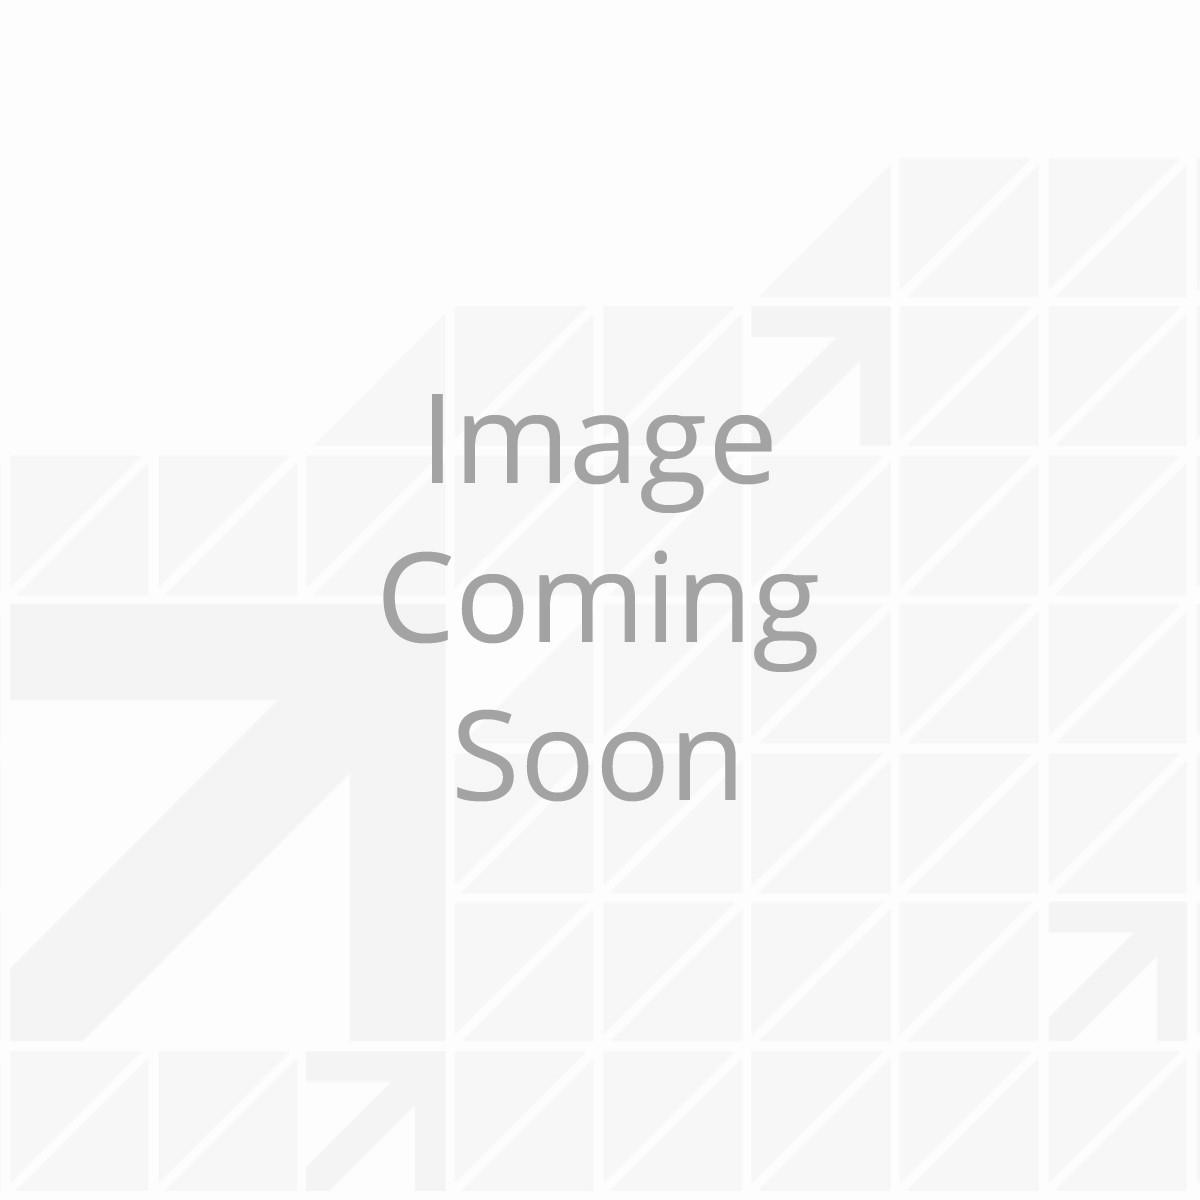 Center Point® Air-Ride Suspension - Tandem Axle Configuration